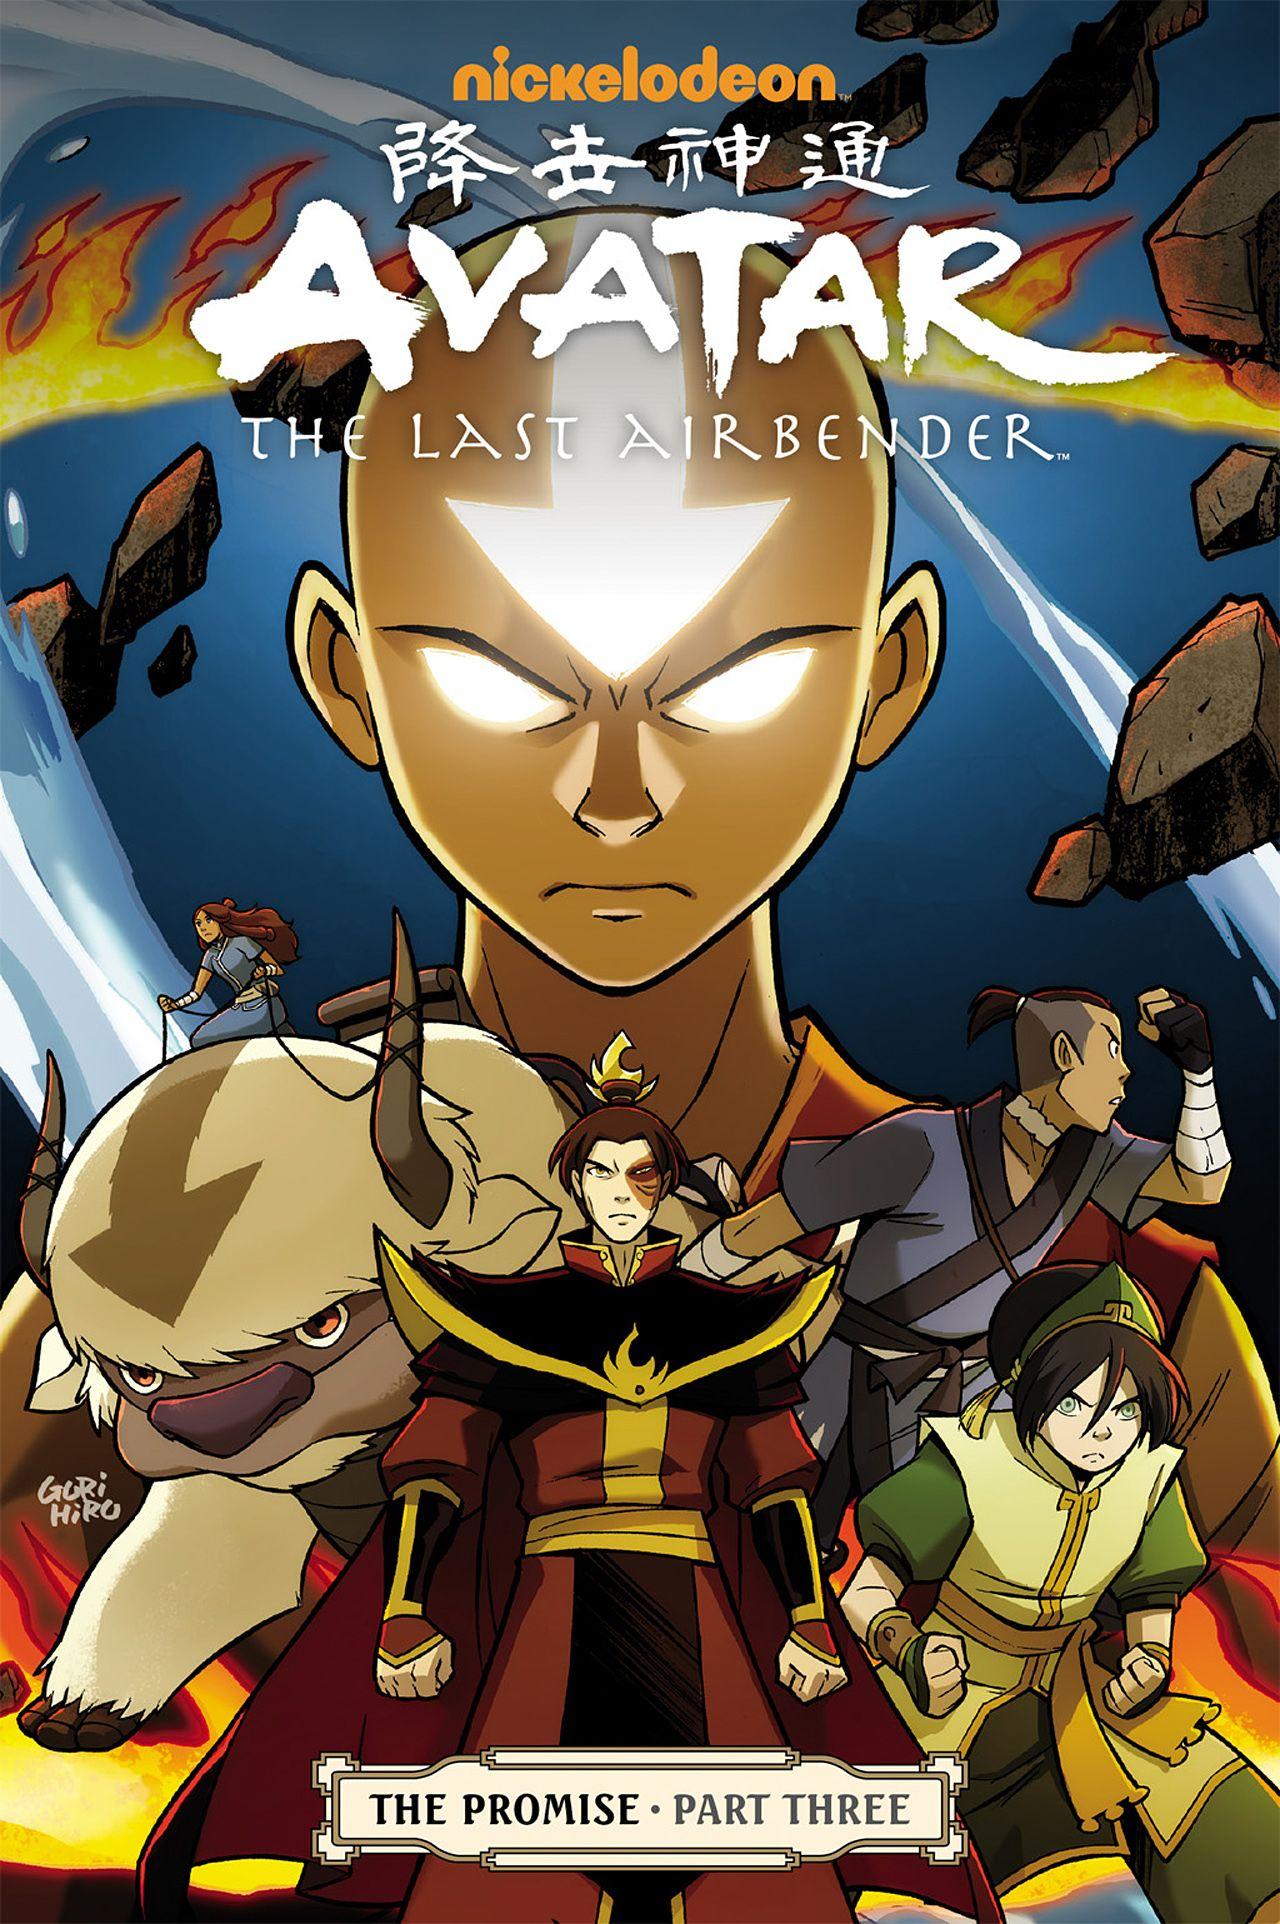 Nickelodeon Avatar The Last Airbender The Promise Part 3 Zuko